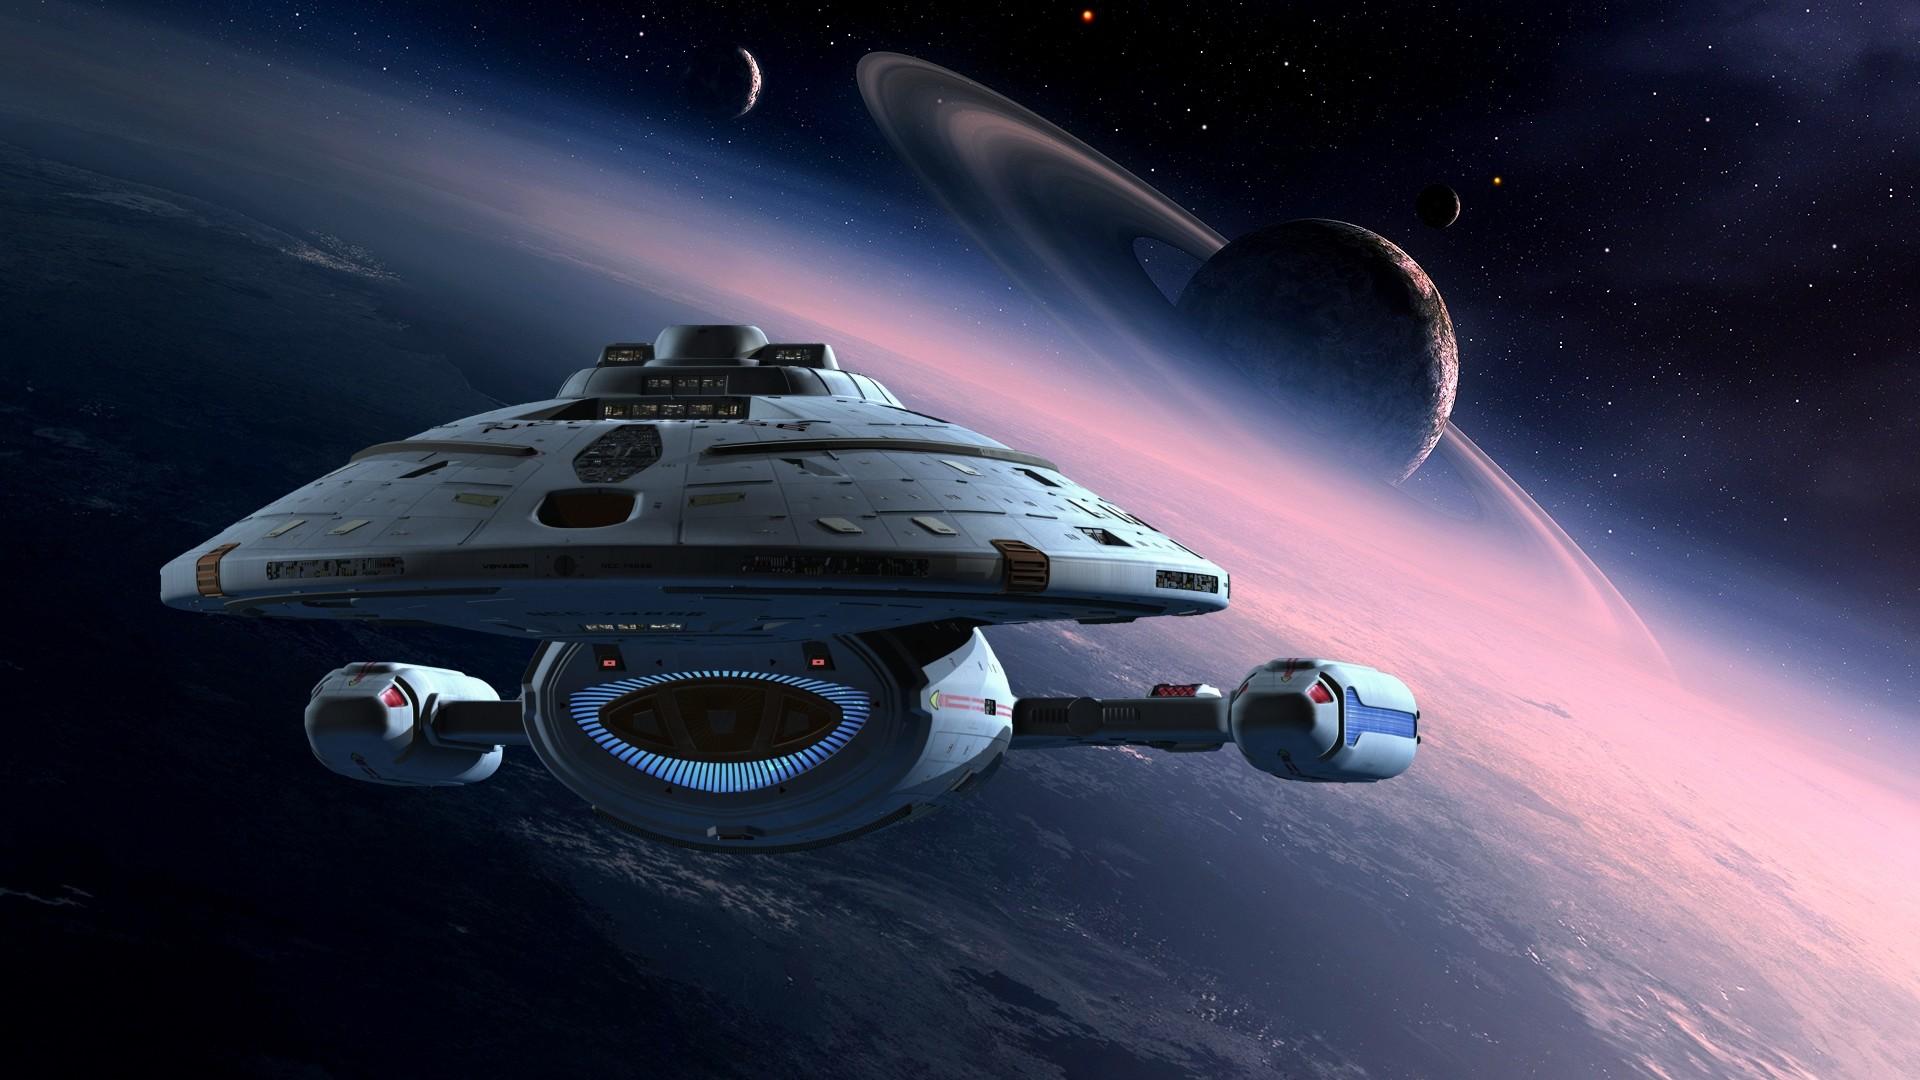 USS Centaur (Star Trek) [1920×1080] Need #iPhone #6S #Plus #Wallpaper/  #Background for #IPhone6SPlus? Follow iPhone 6S Plus 3Wallpapers/  #Backgroun…